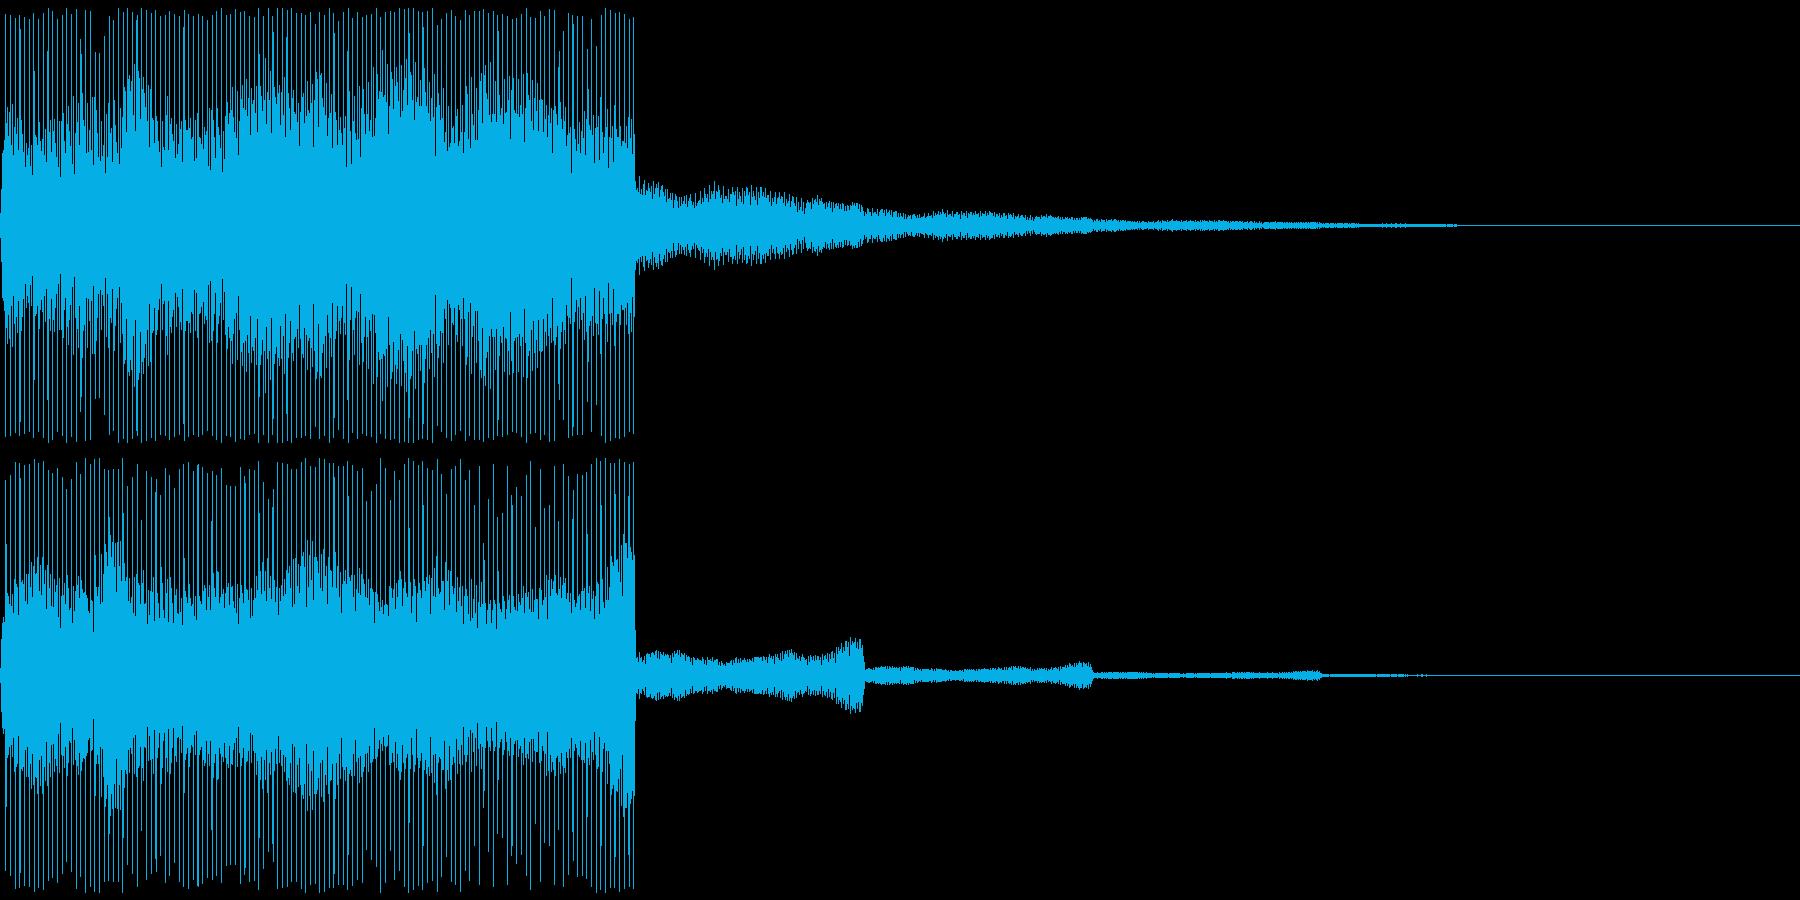 【SE 効果音】電気音の再生済みの波形